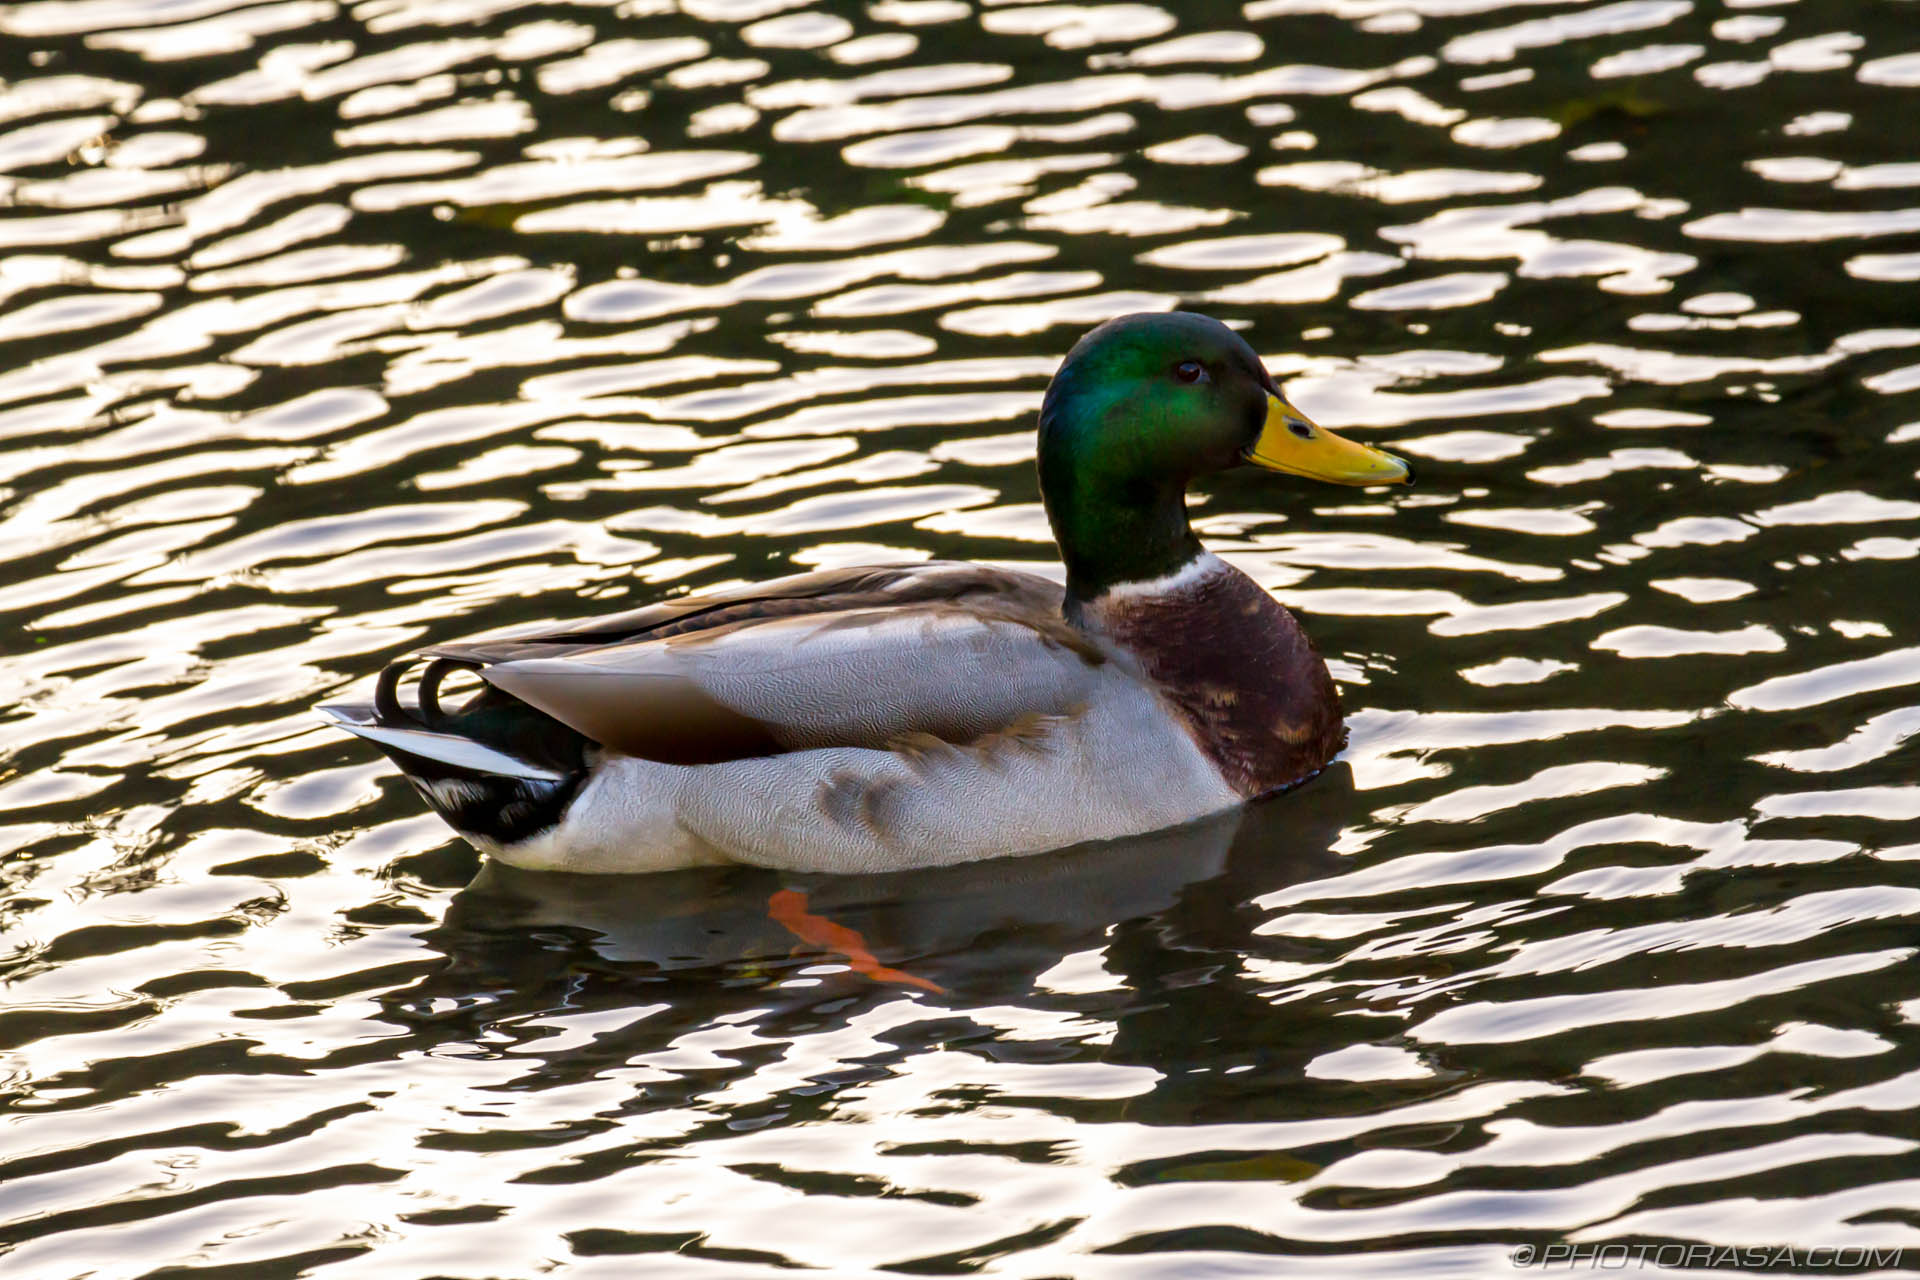 https://photorasa.com/mallard-ducks/duck-on-reflected-water/